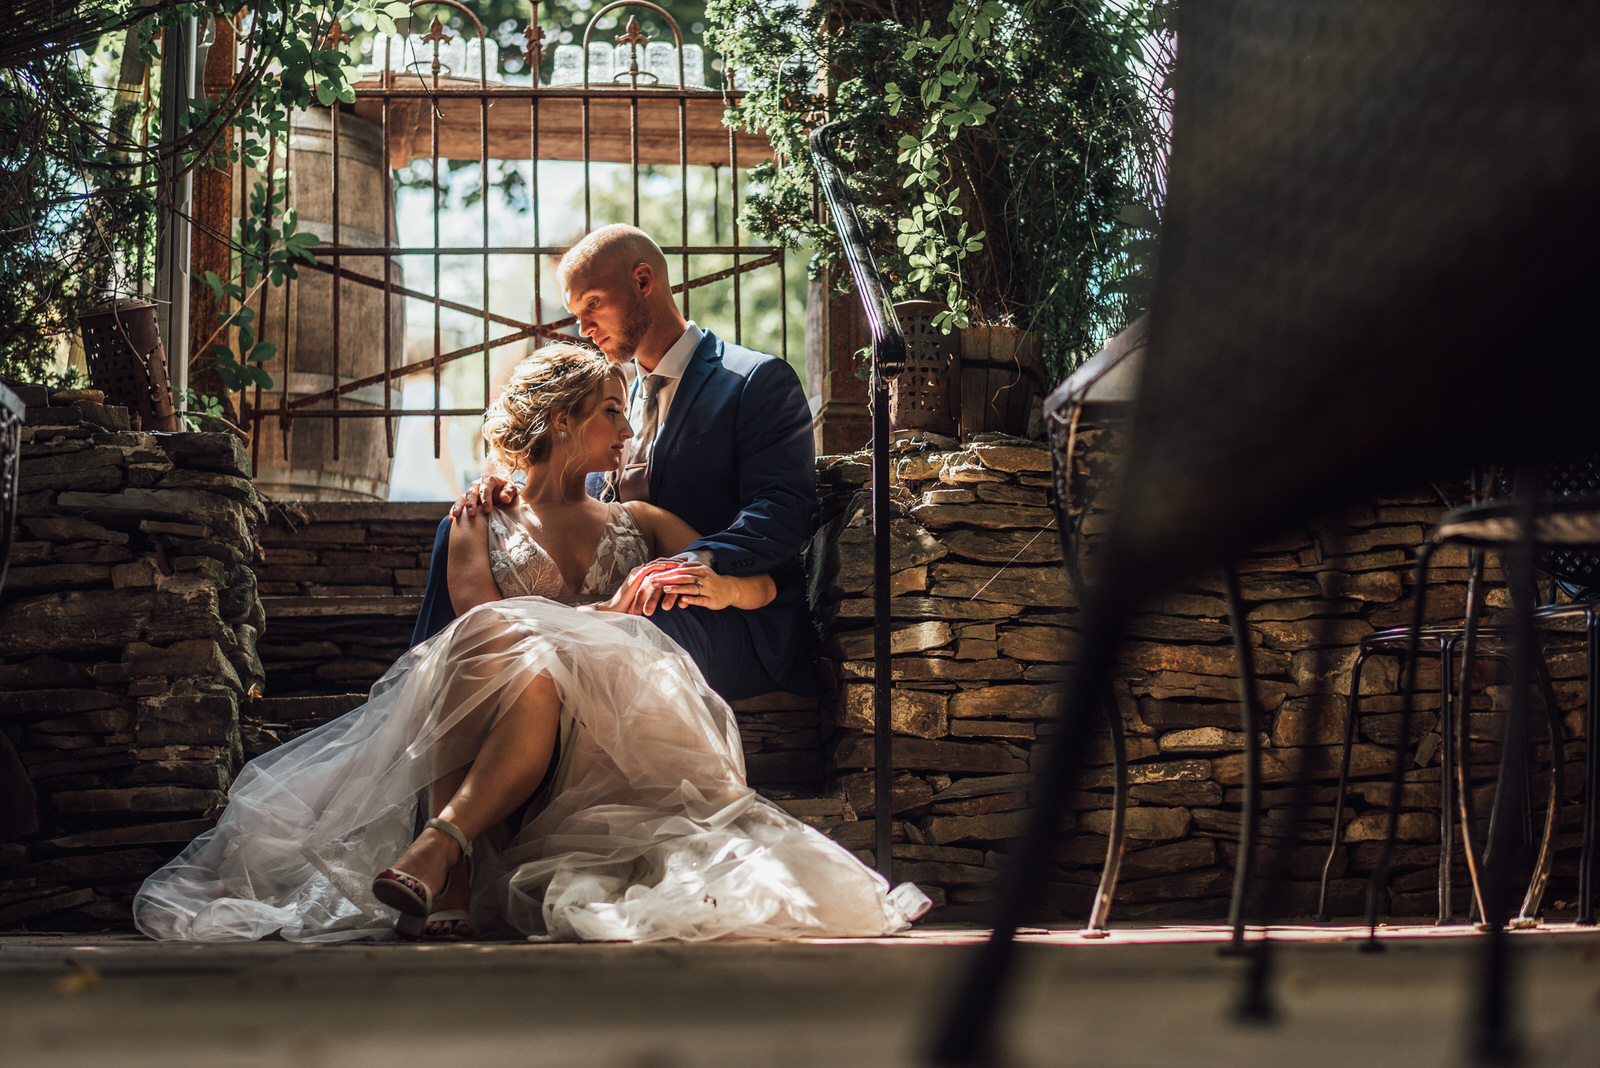 Wedding Photography » New Jersey Wedding Photography